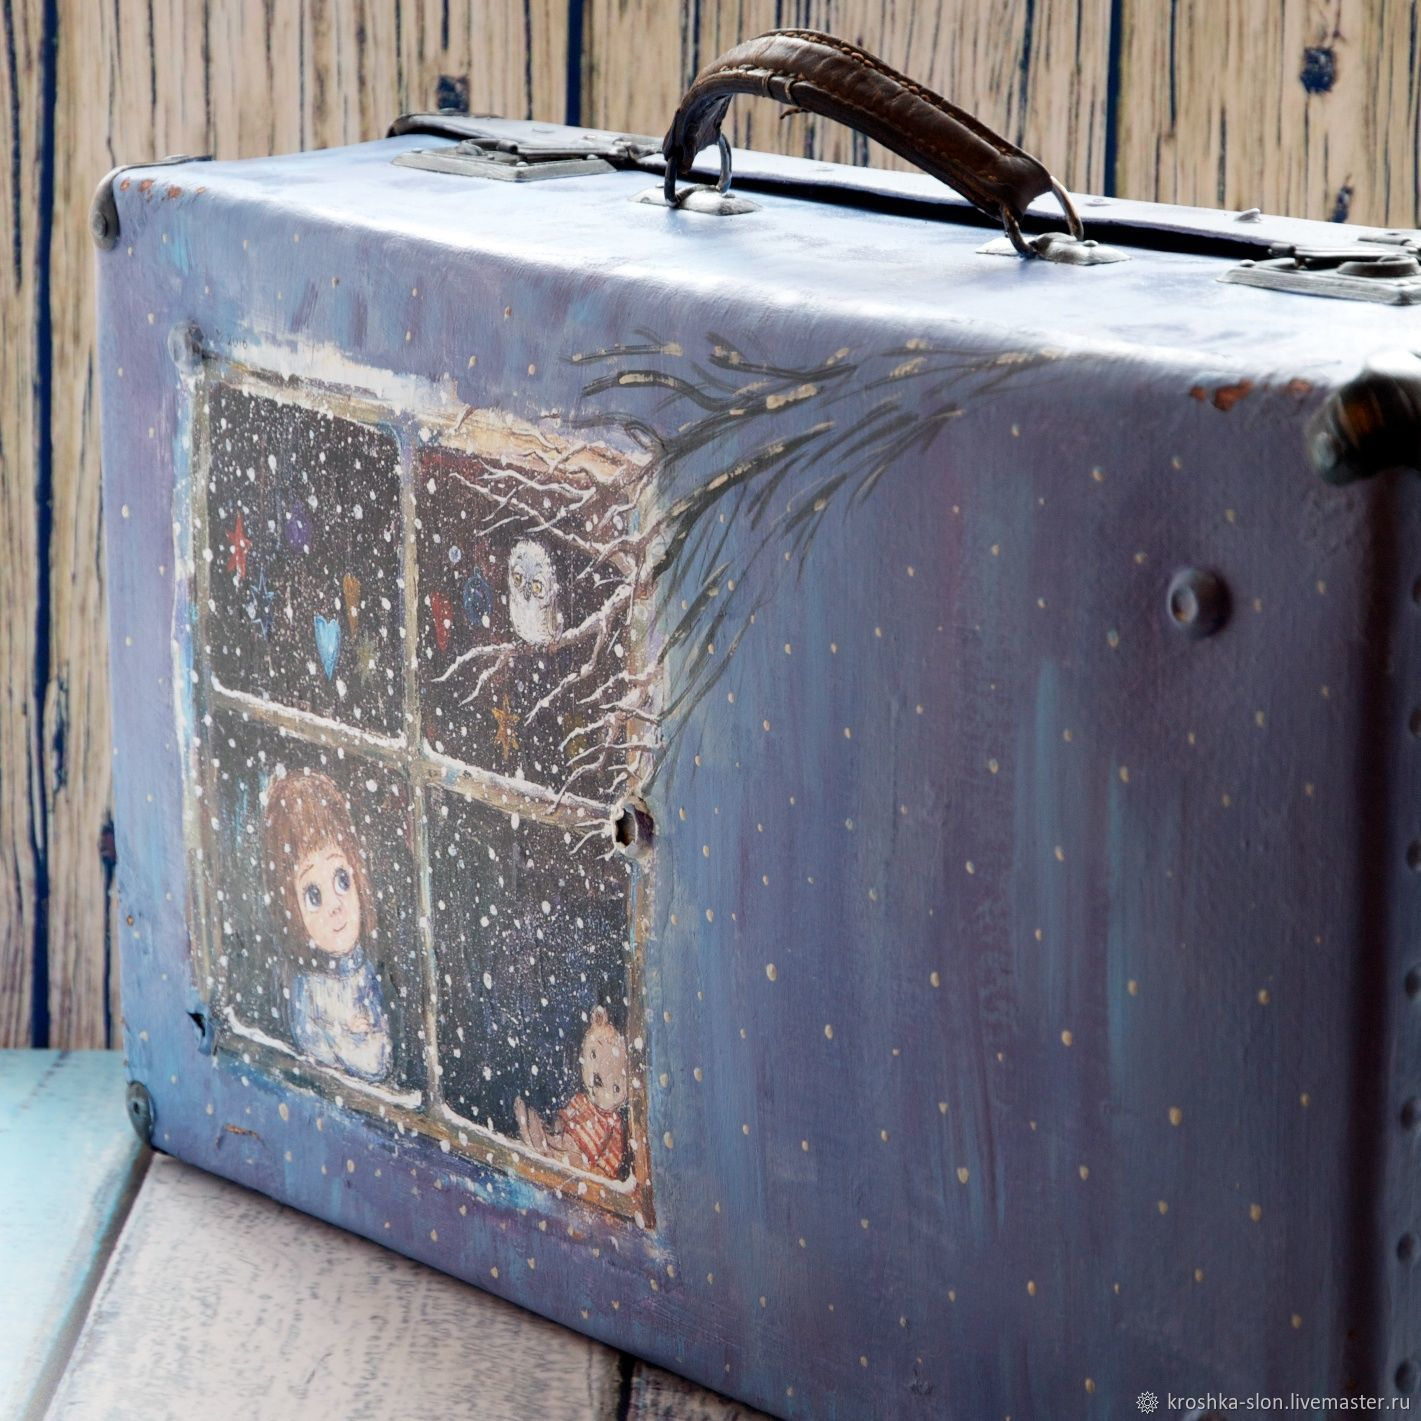 Ярмарка Мастеров - ручная работа. Купить Большой старый чемодан. Handmade · Чемоданы  ручной работы. Большой старый чемодан. Татьяна Косова (tatyanakosova). 70b59d4ac97